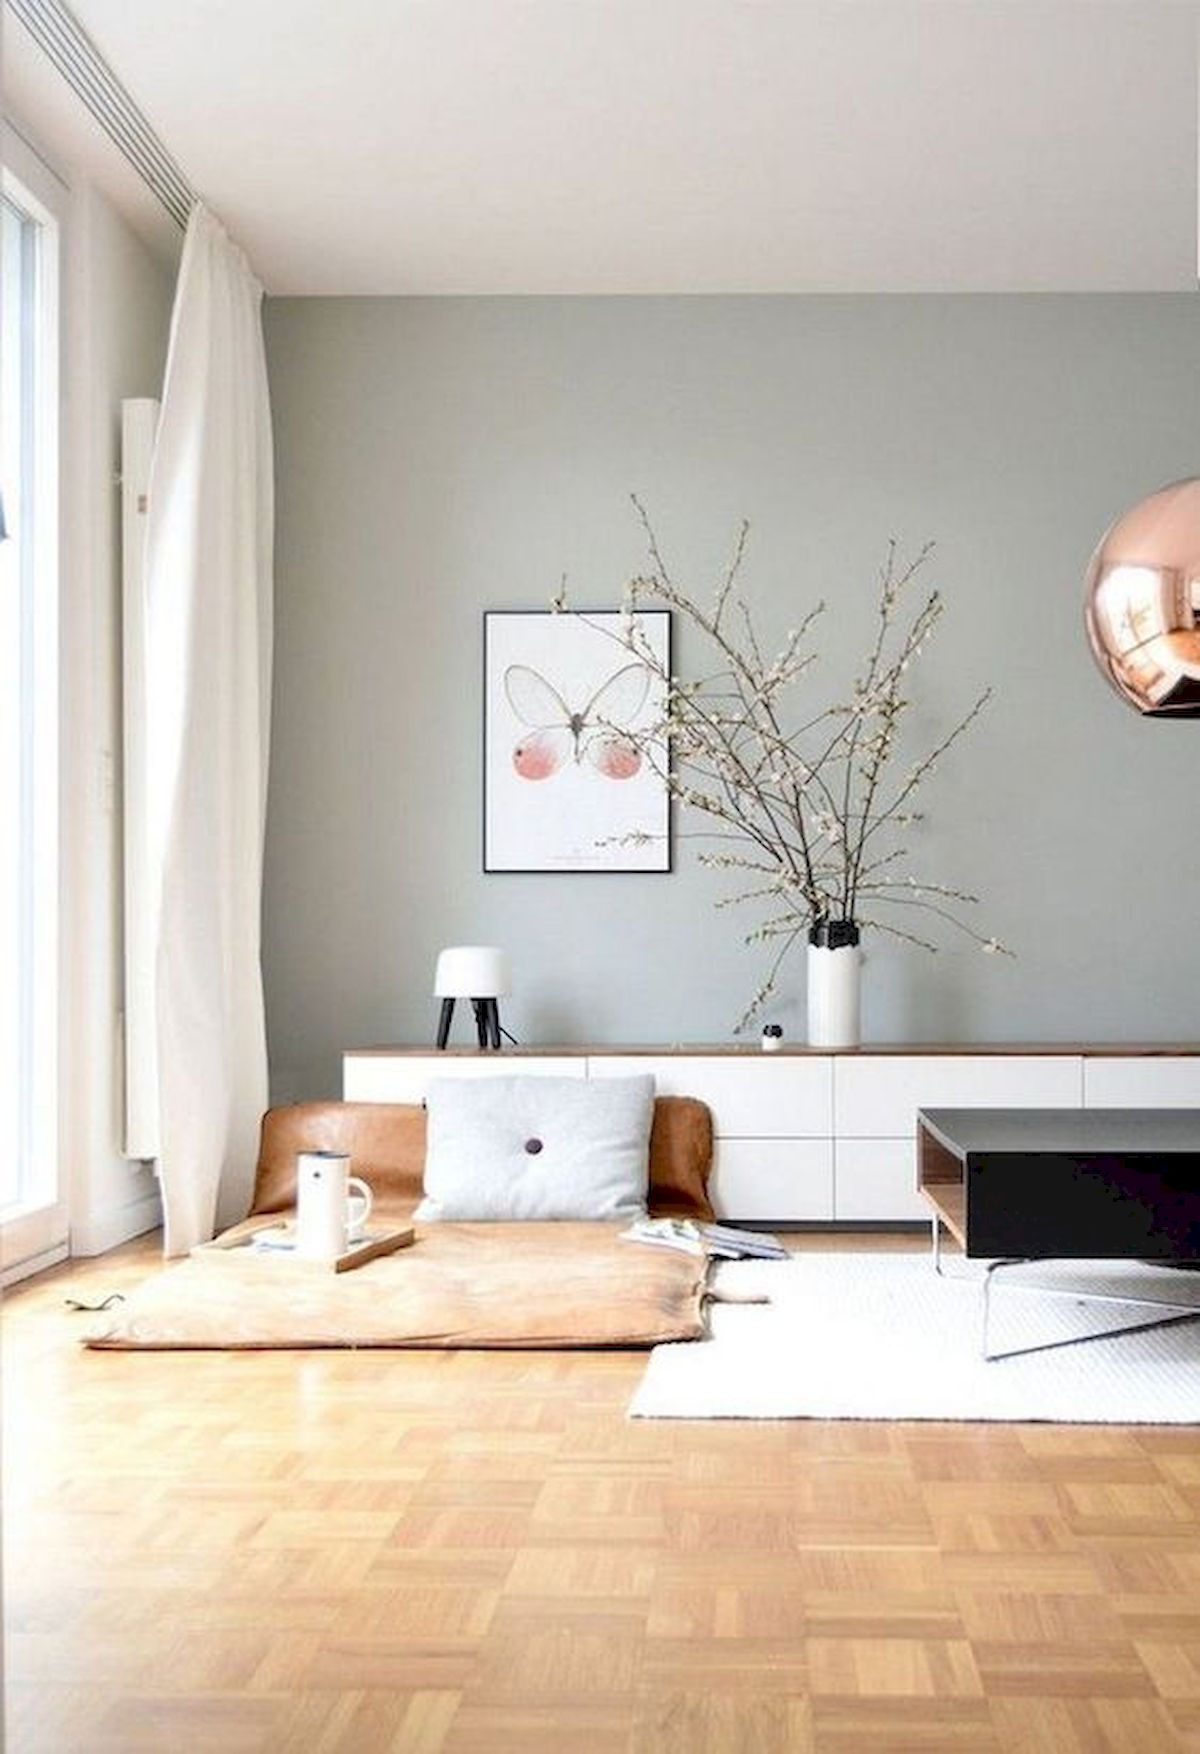 35 Stunning Scandinavian Interior Design and Decor Ideas (24)